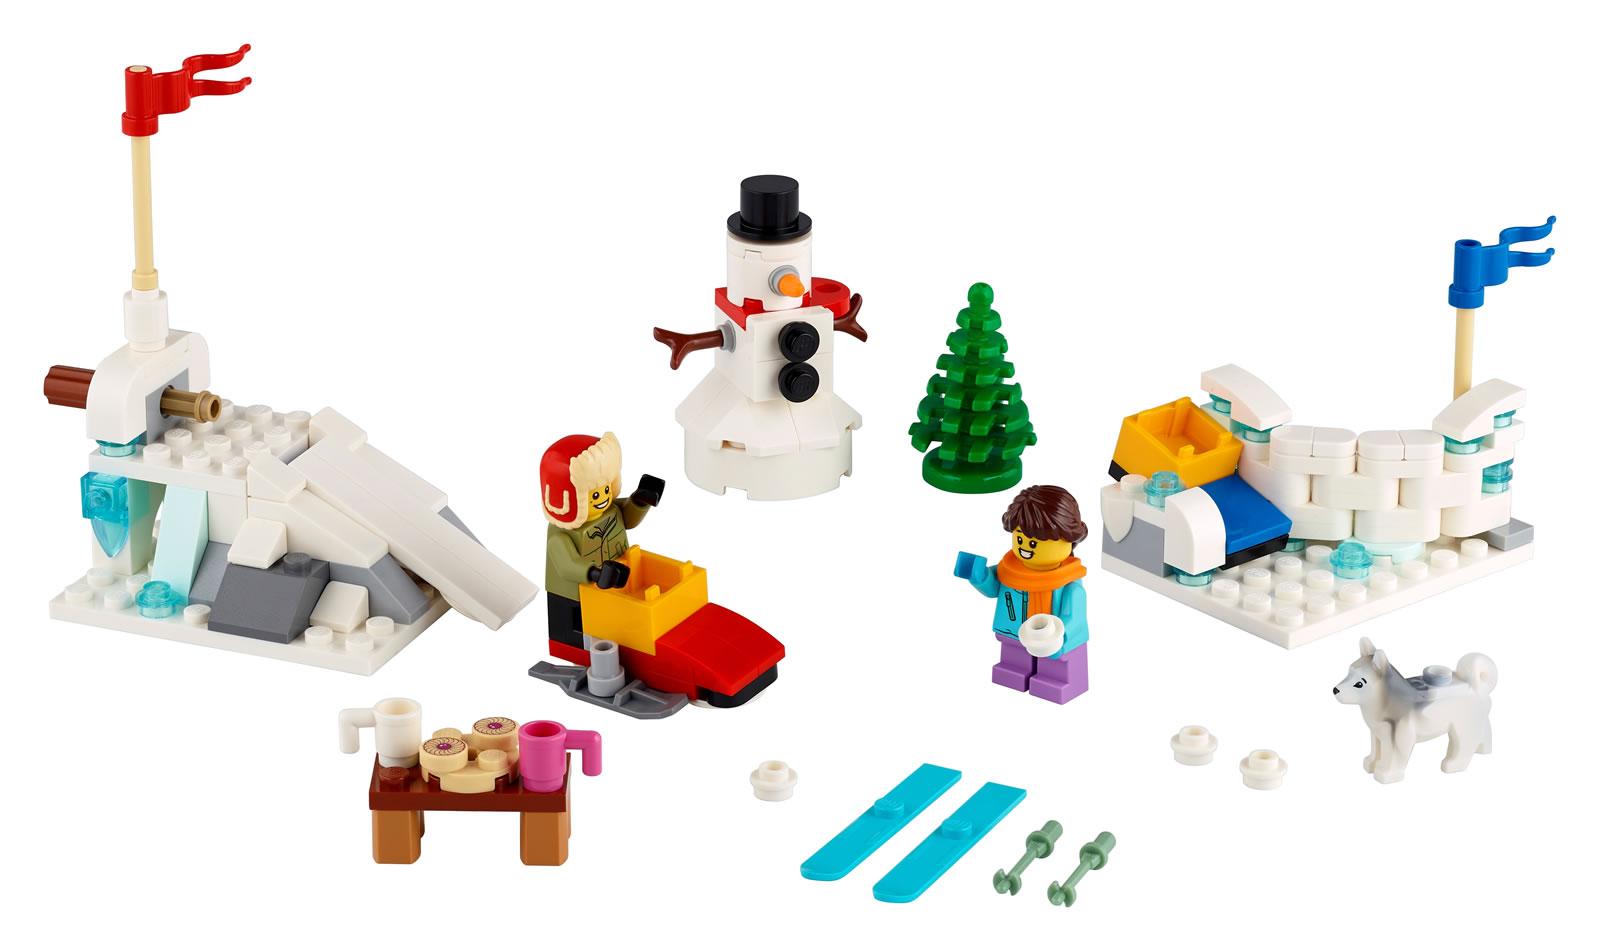 lego-seasonal-40424-winter-snowball-fight-schneeballschlacht-2020-1 zusammengebaut.com